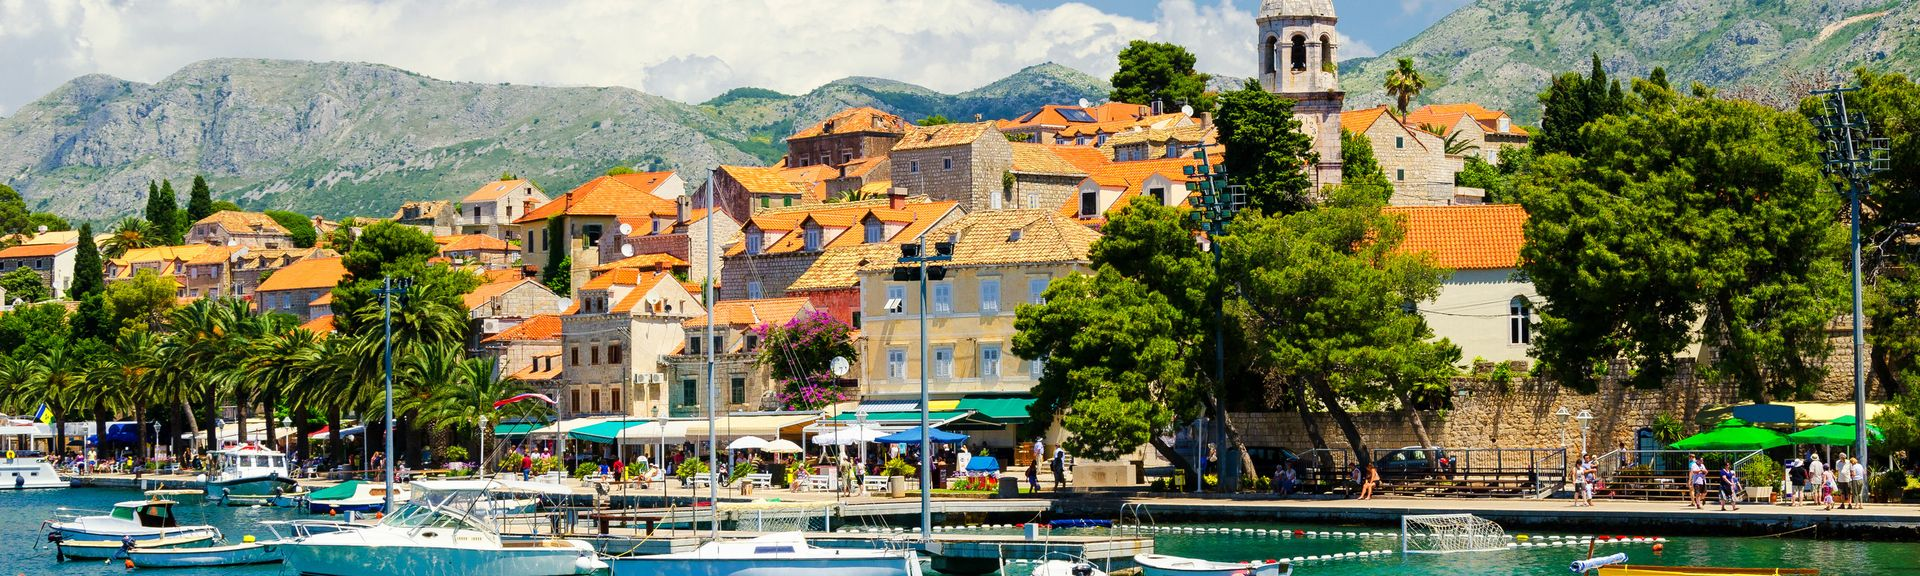 Cavtat, Dubrovnik-Neretva, Kroatia